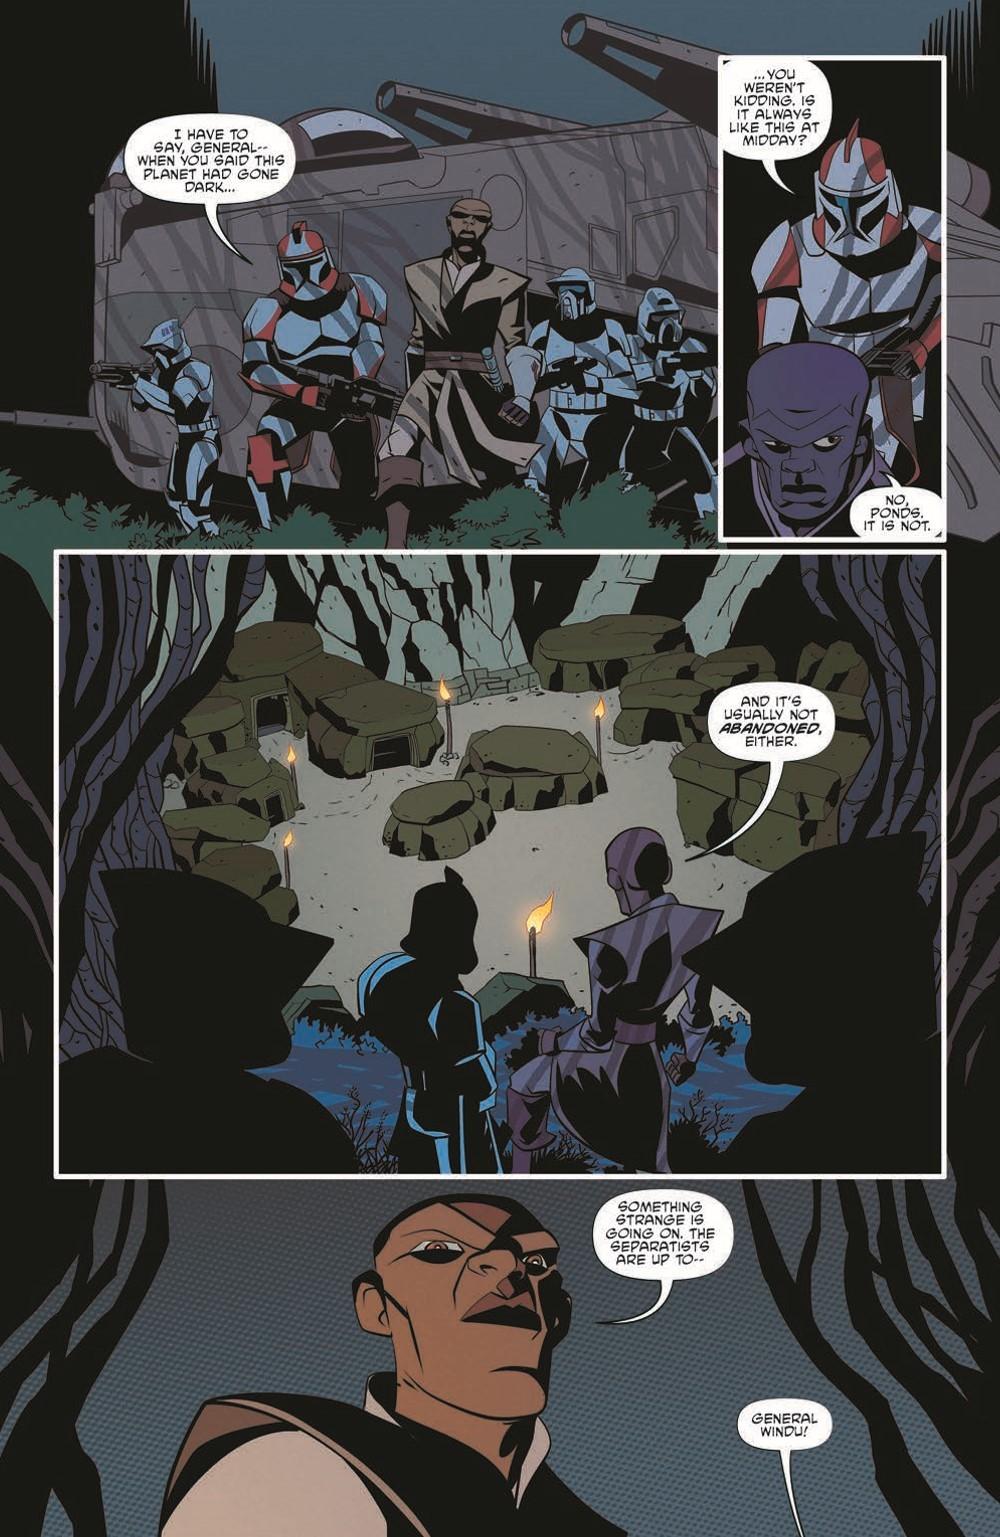 StarWarsAdv09-pr-4 ComicList Previews: STAR WARS ADVENTURES VOLUME 2 #9